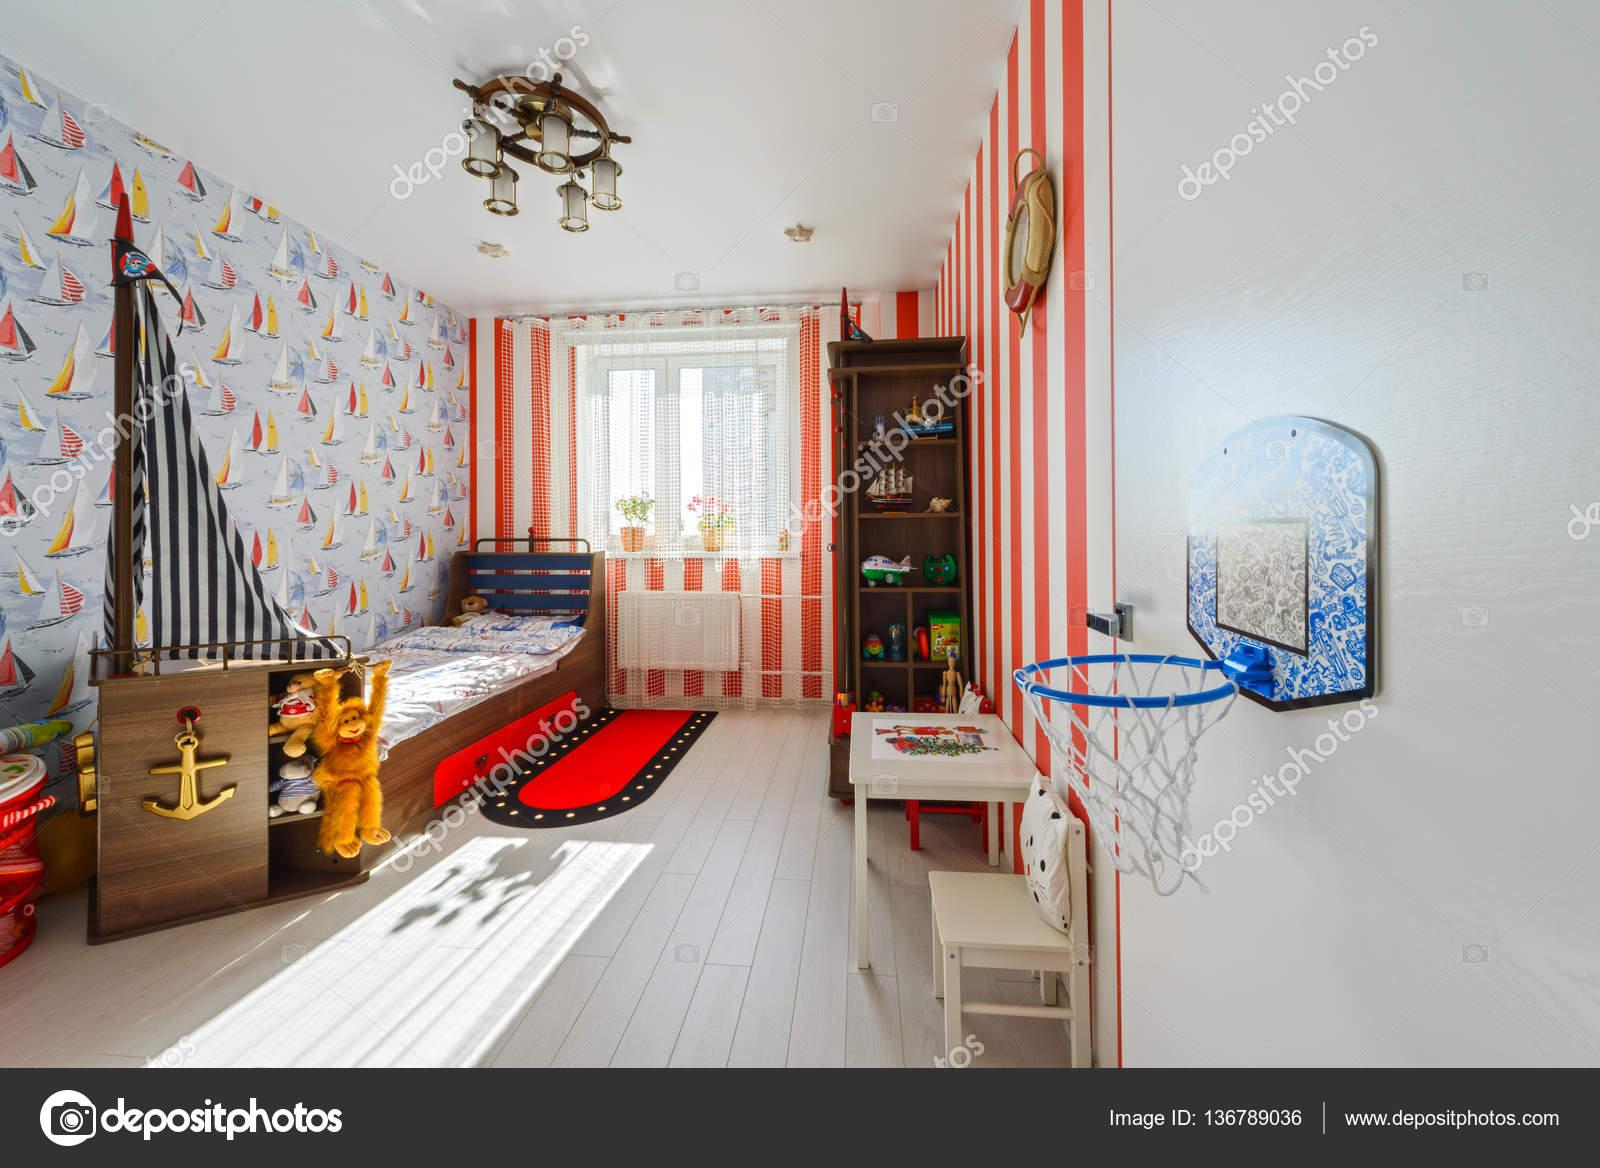 Fragment interieur van moderne kinderkamer met rode meubels en